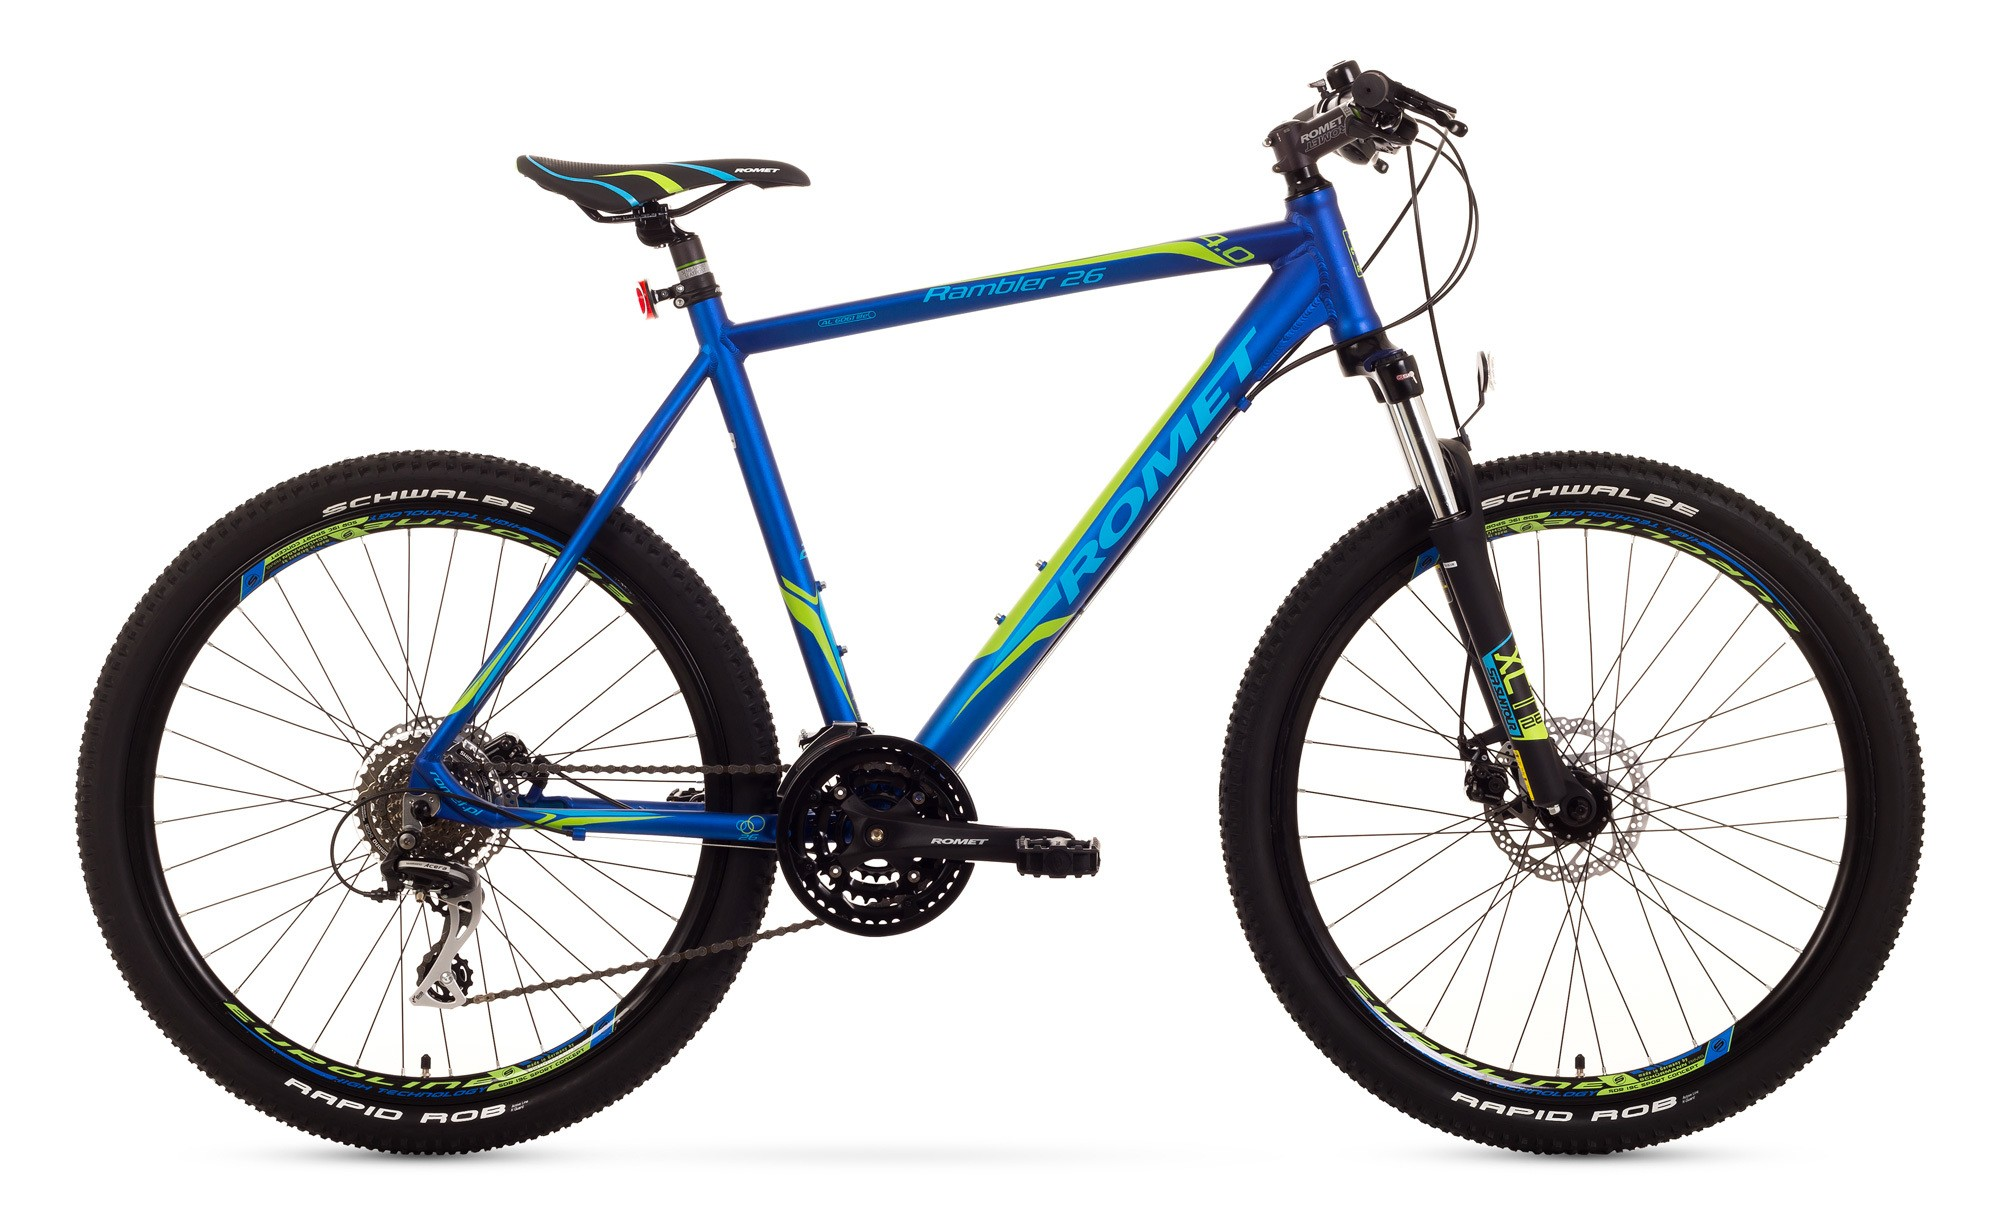 Bicicleta MTB Romet Rambler 26 4.0 - negru-albastru-verde